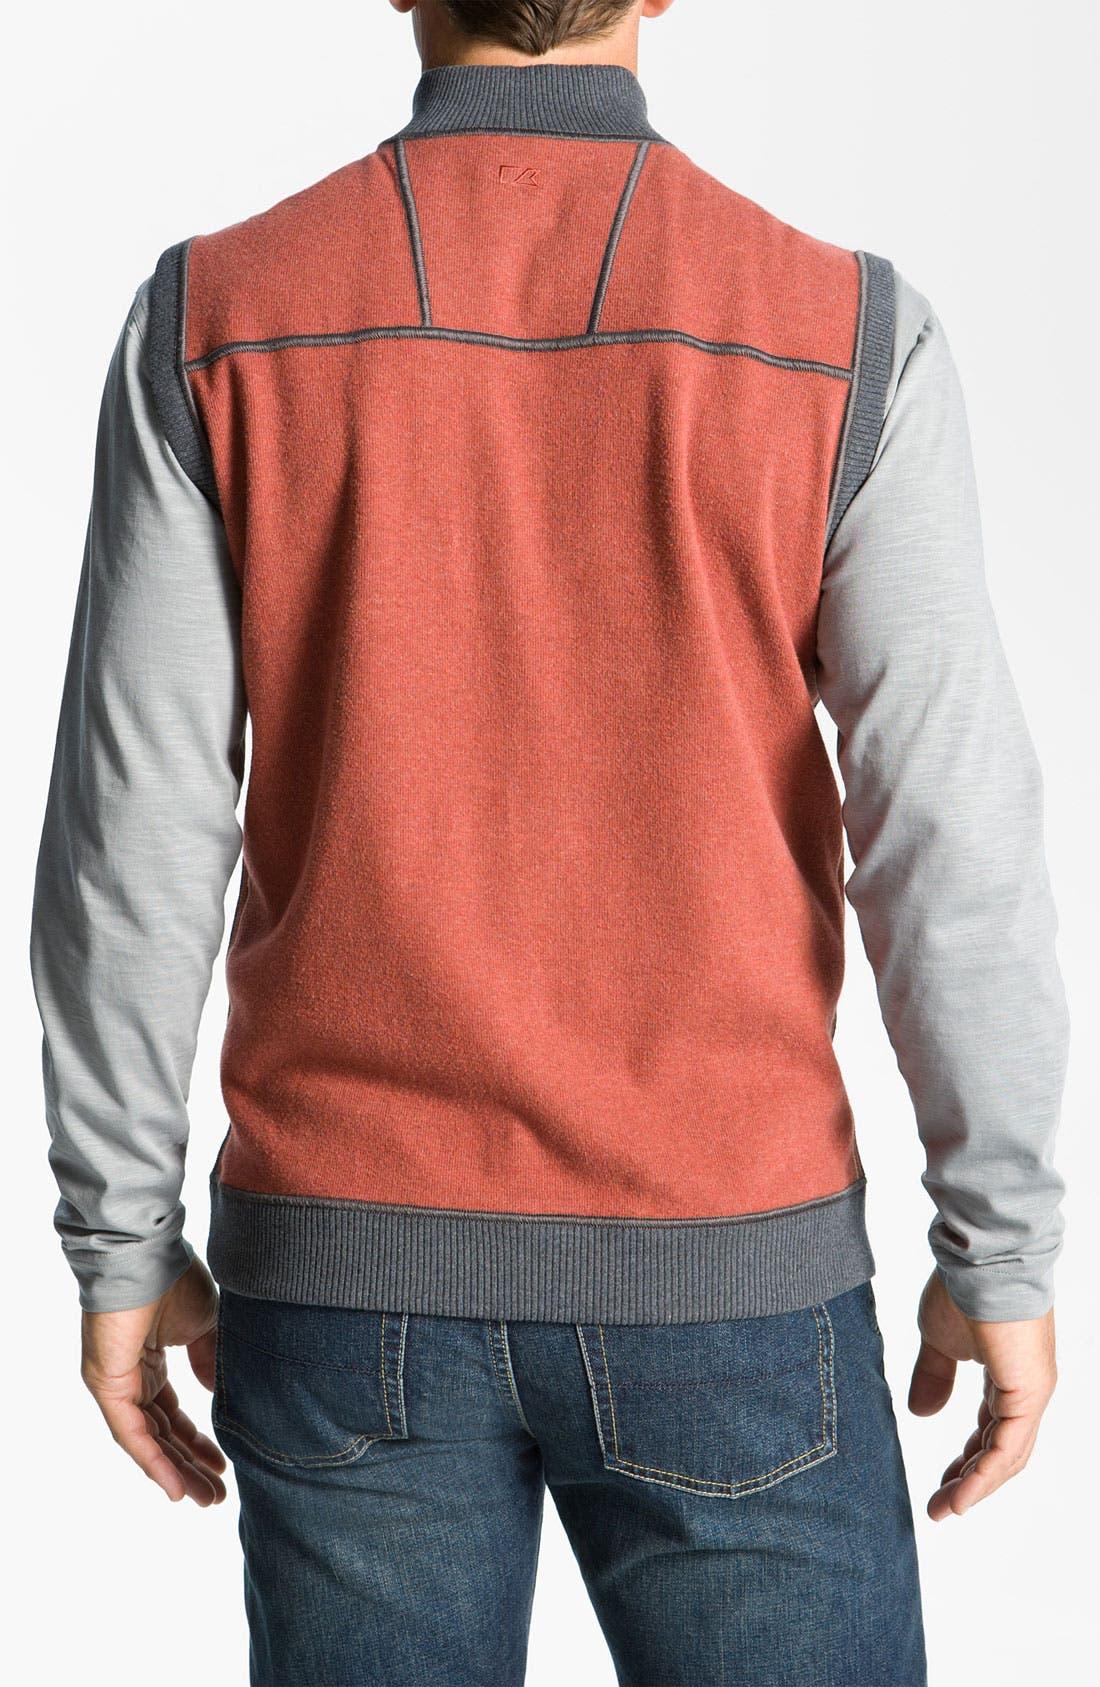 Alternate Image 2  - Cutter & Buck 'Essex' Reversible Half Zip Vest (Big & Tall)